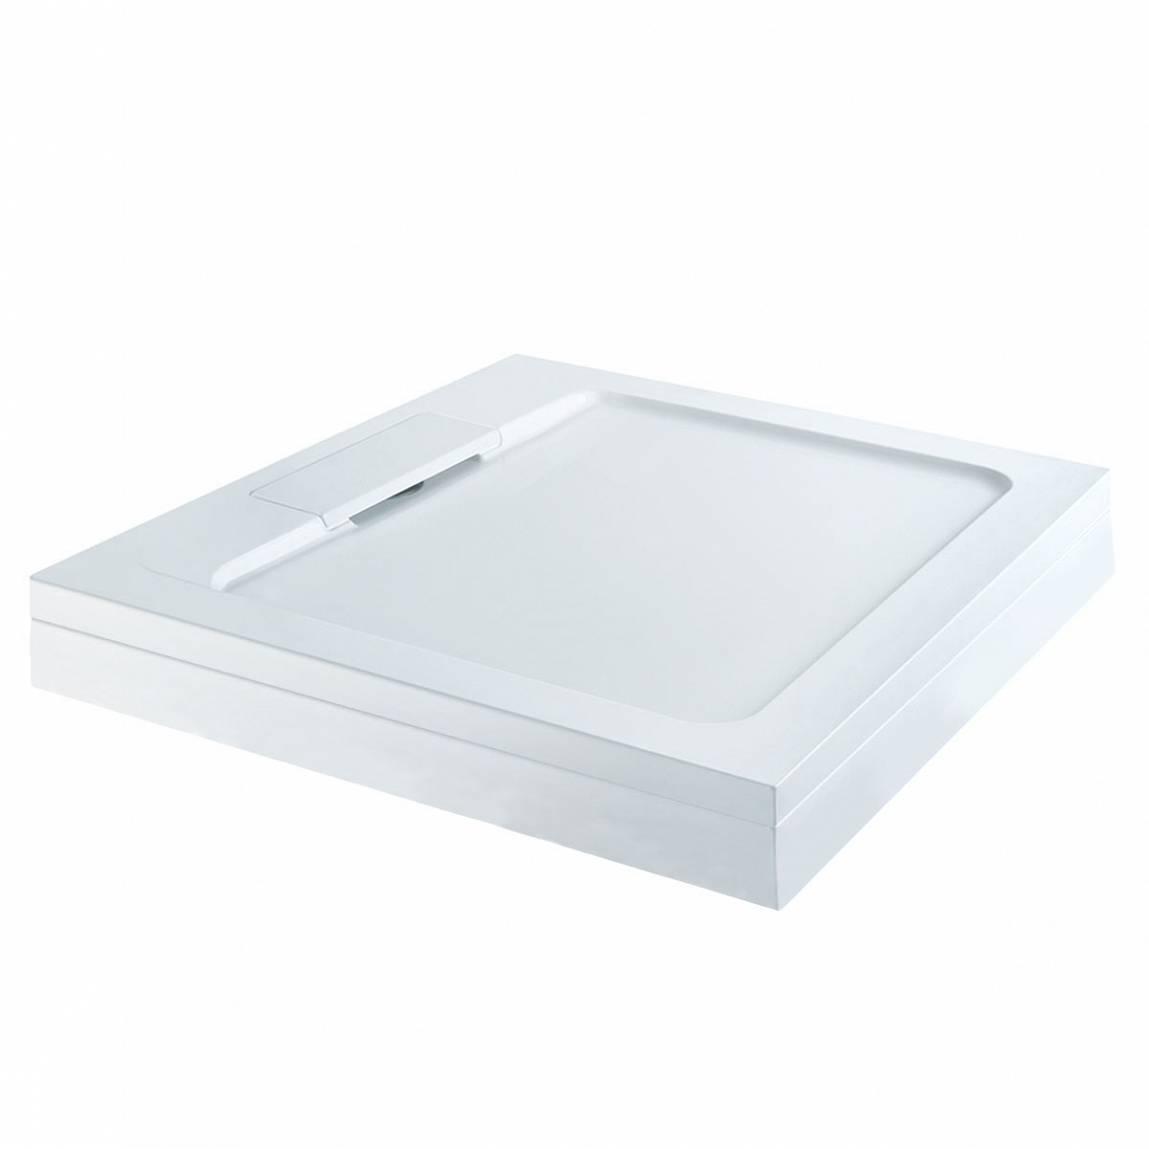 Image of Designer Square Stone Shower Tray & Riser Kit 900 x 900